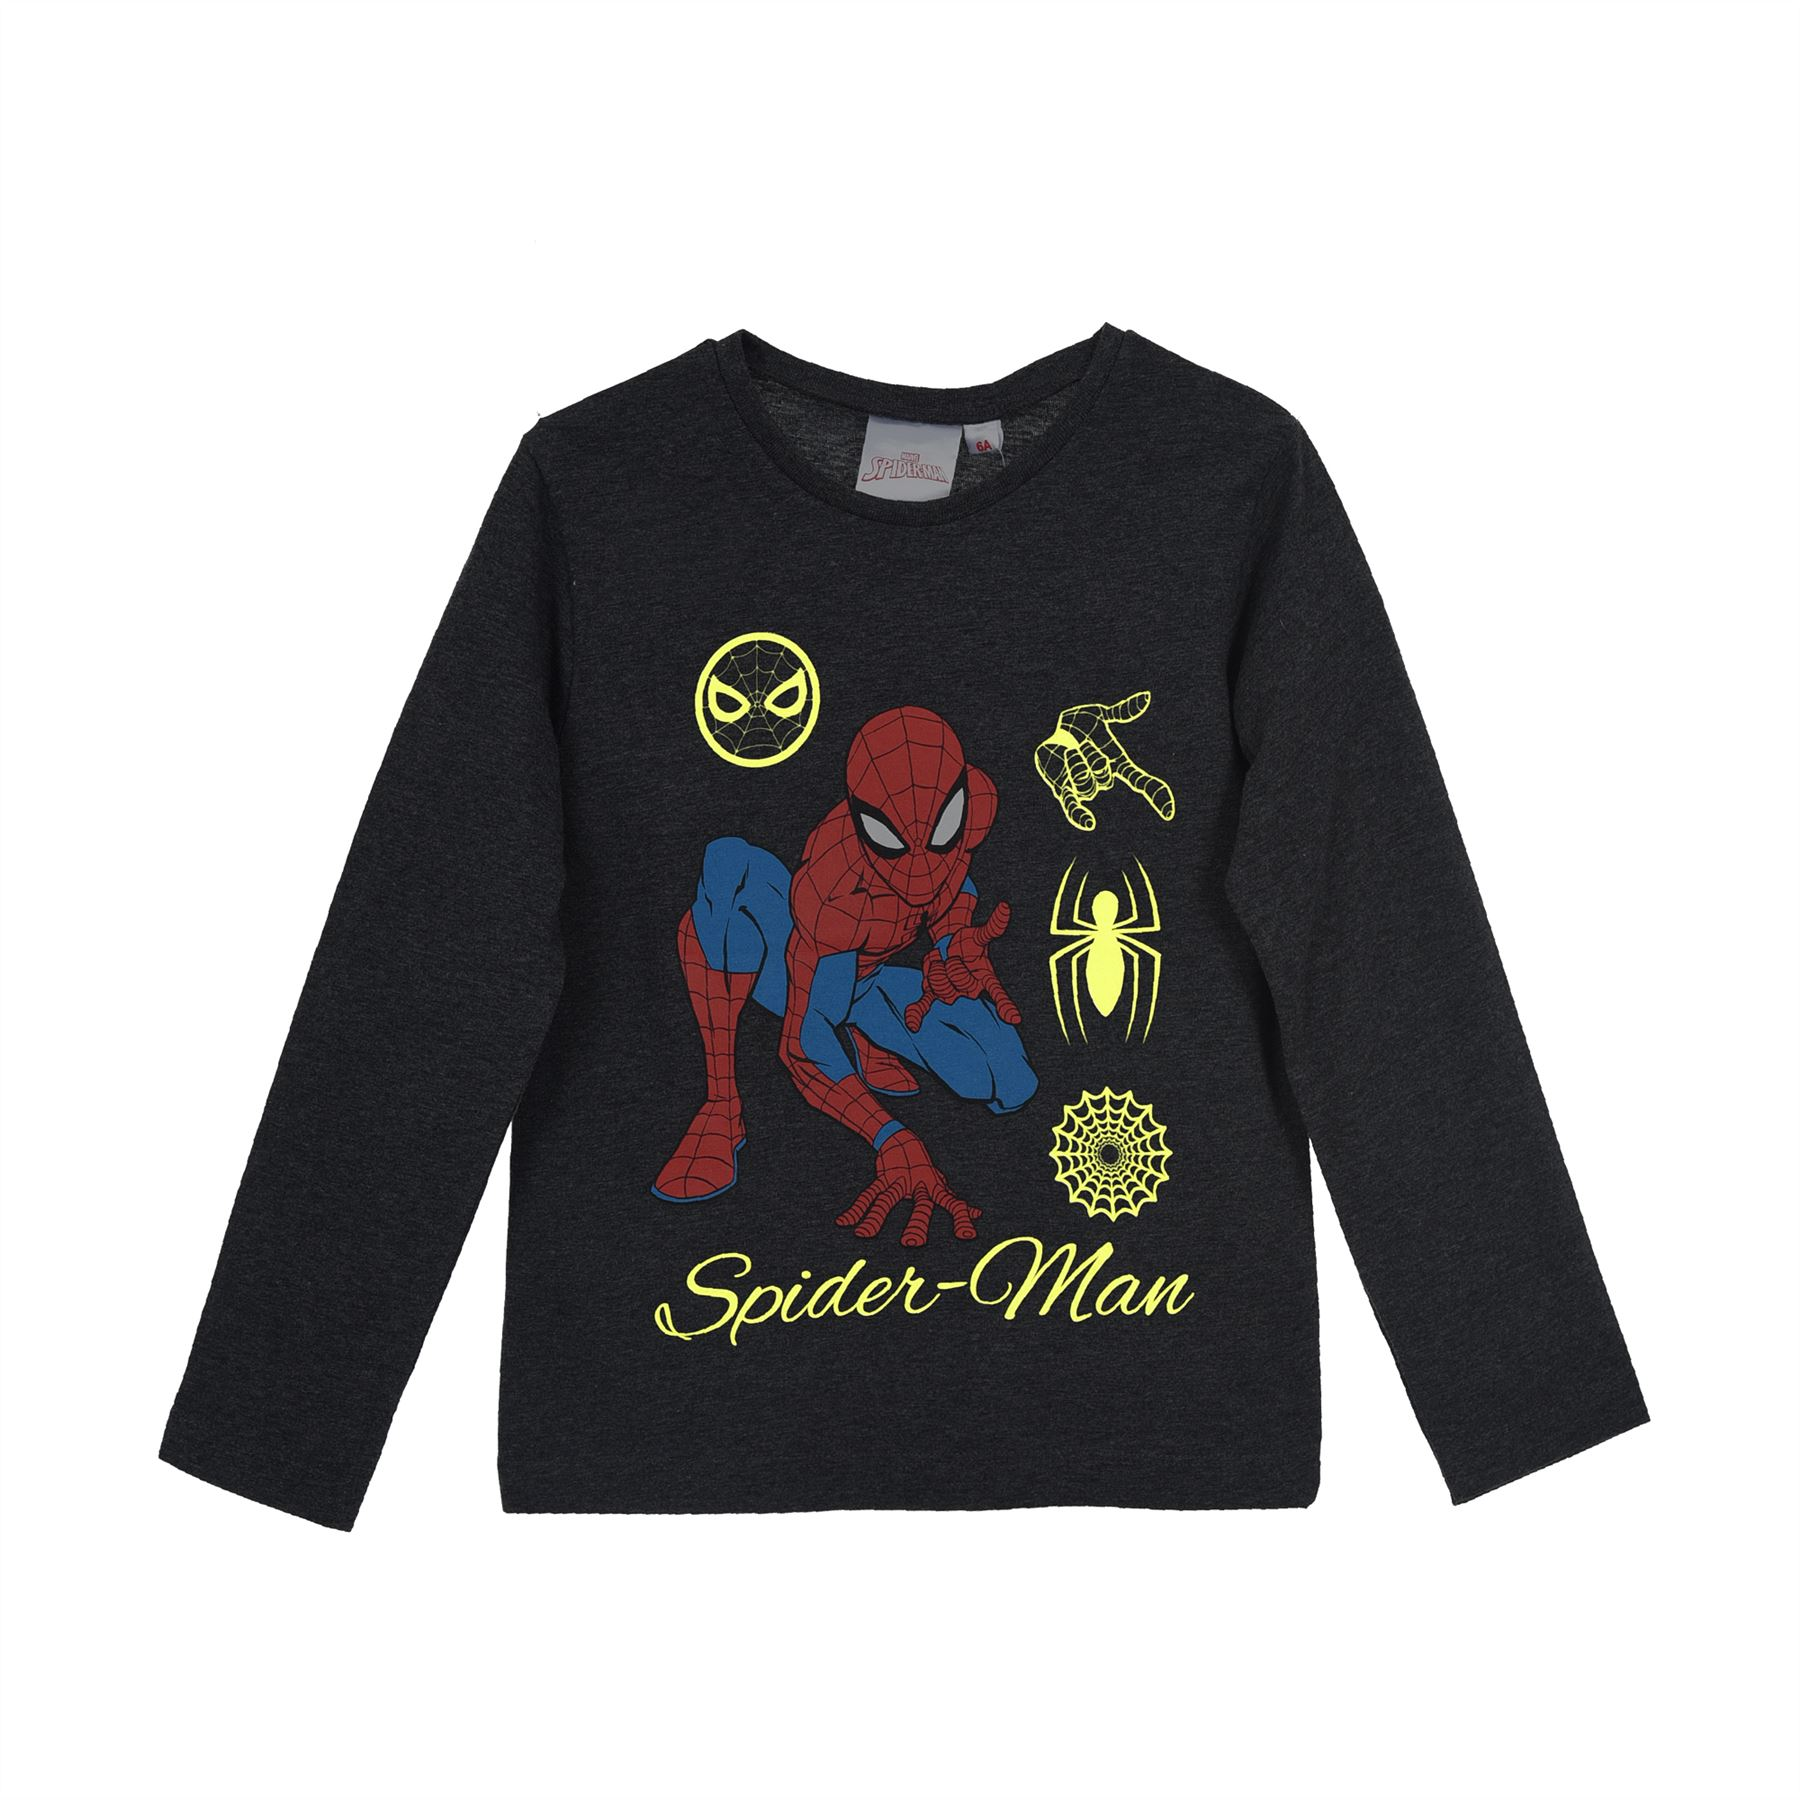 Boys Kids Official Spiderman Long Sleeve Sweatshirt Jumper Age 3-8 Years NEW